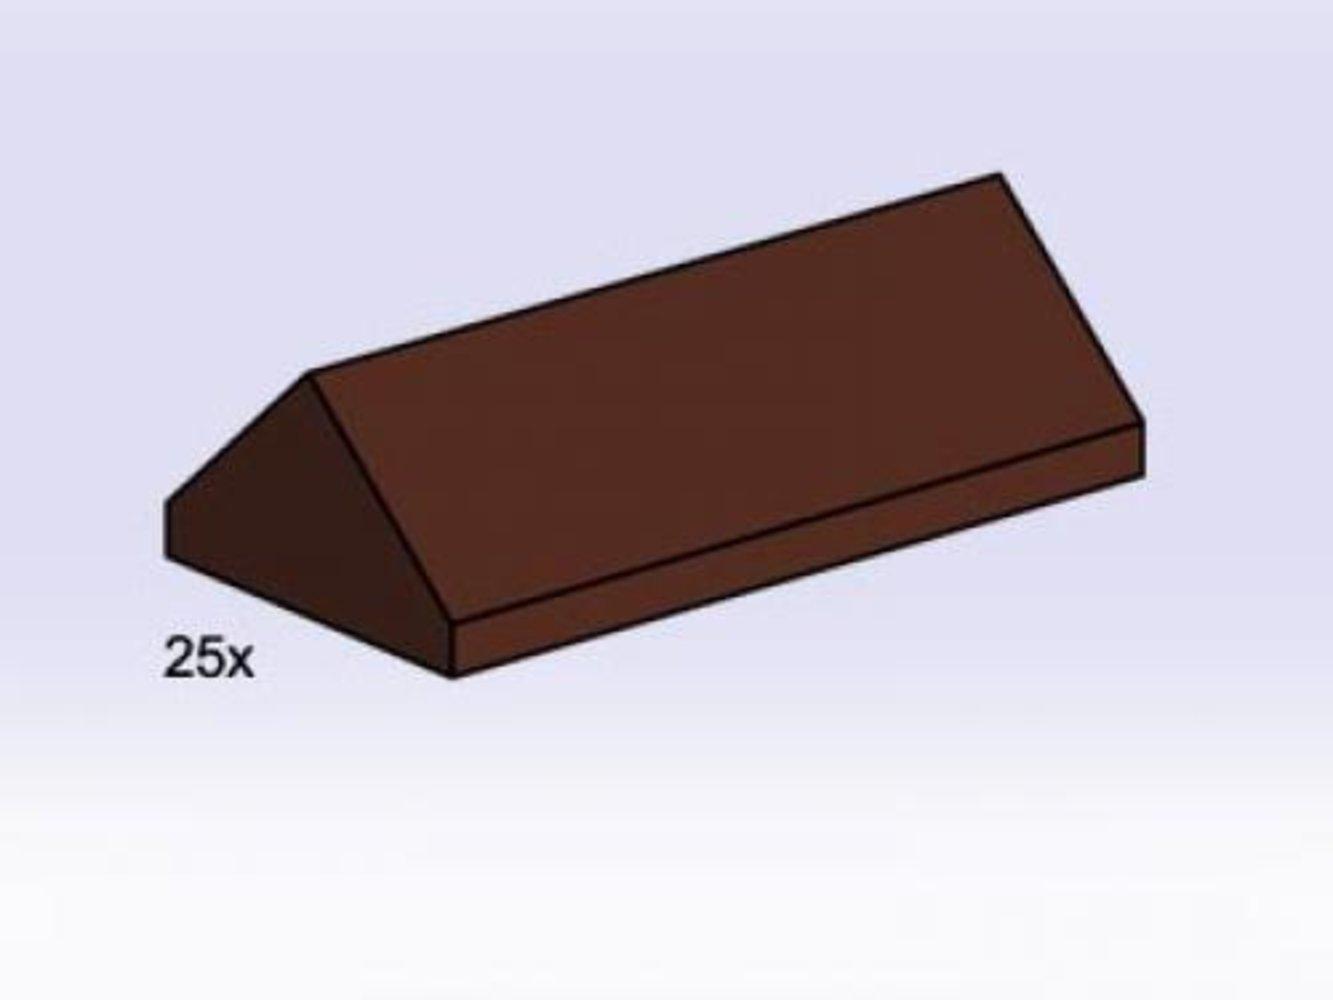 2 x 4 Brown Ridge Roof Tiles Steep Sloped